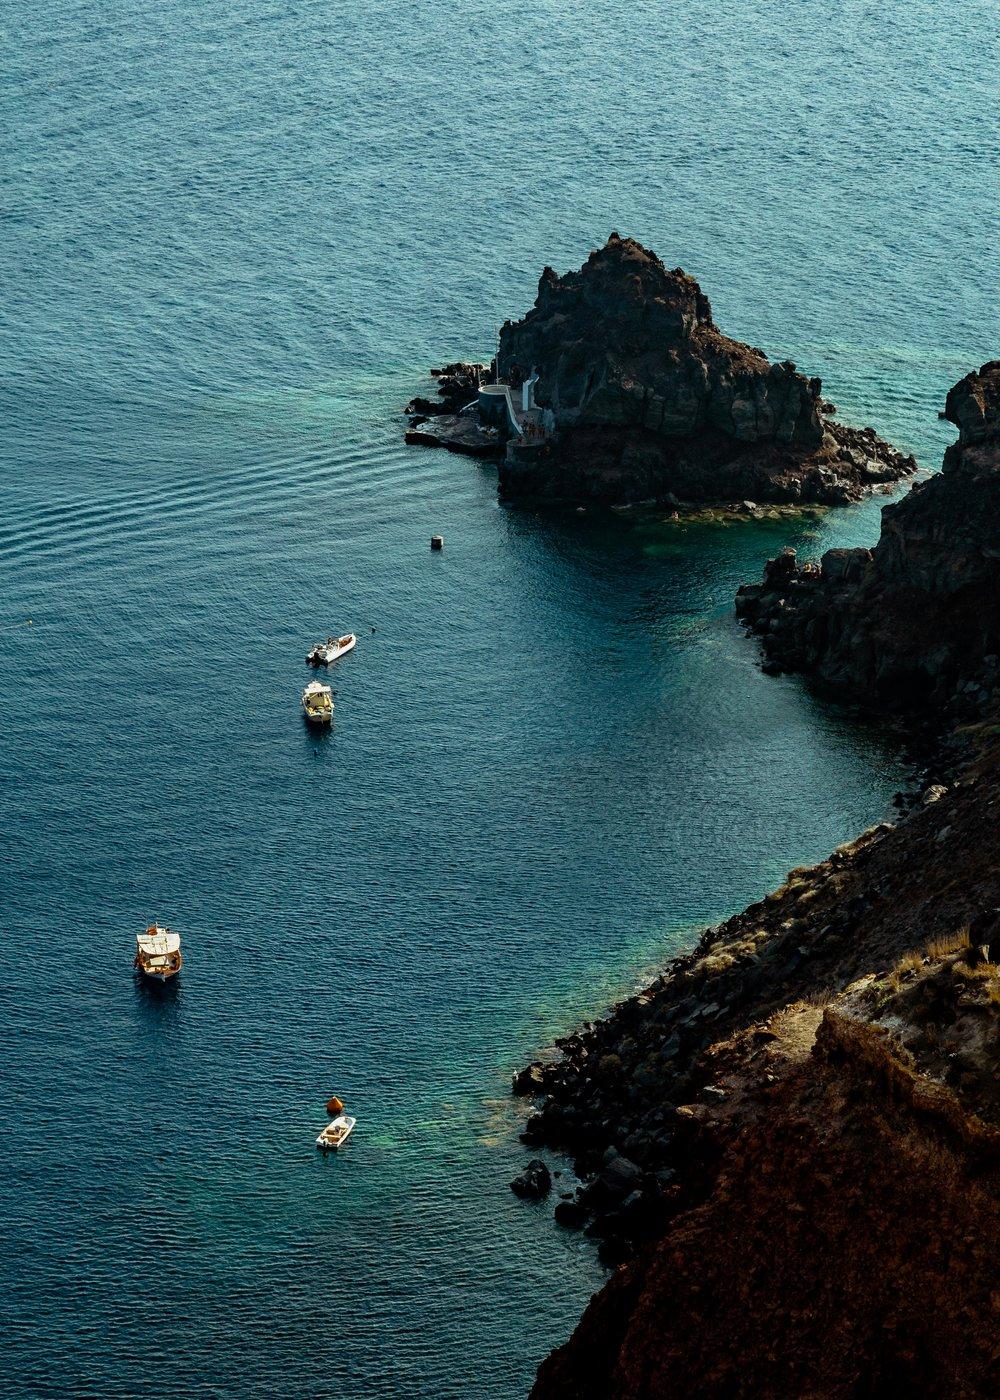 31-santorini-ia-oia-greece-volcanic-crater-sailing-anna-elina-lahti-photographer.jpg